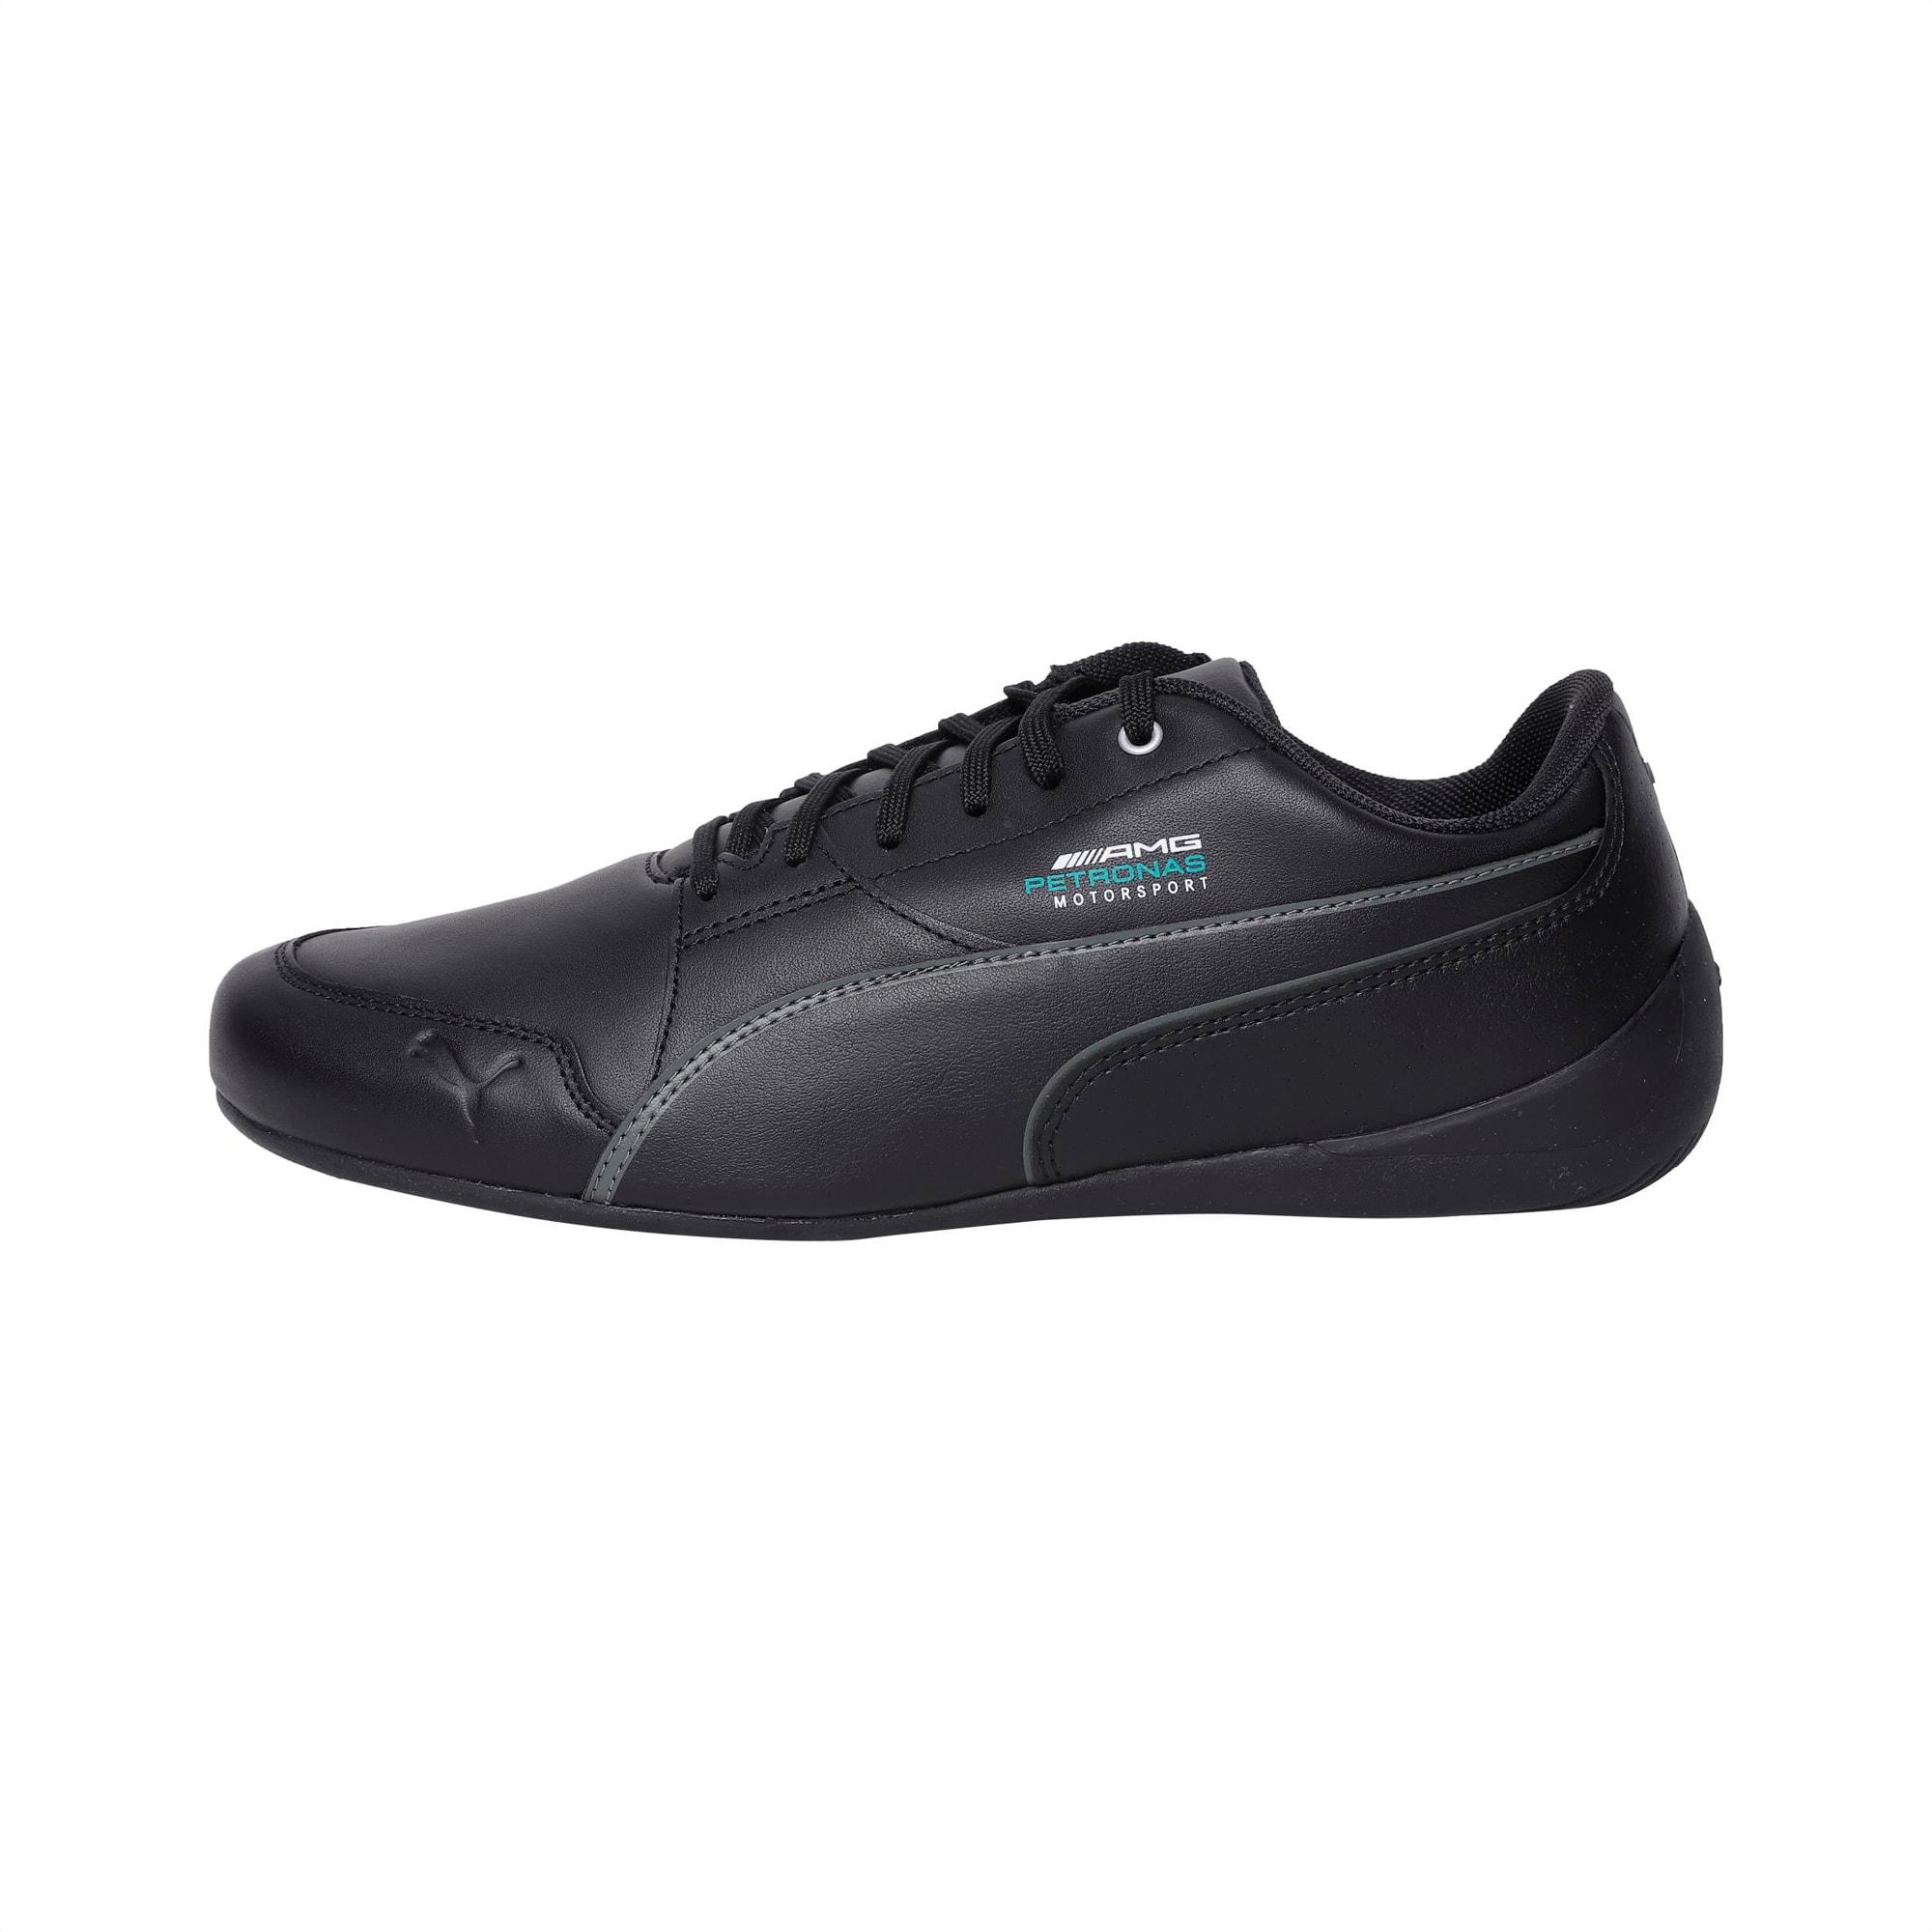 PUMA Women's Muse Echo Satin EP Sneakers Badminton shoes